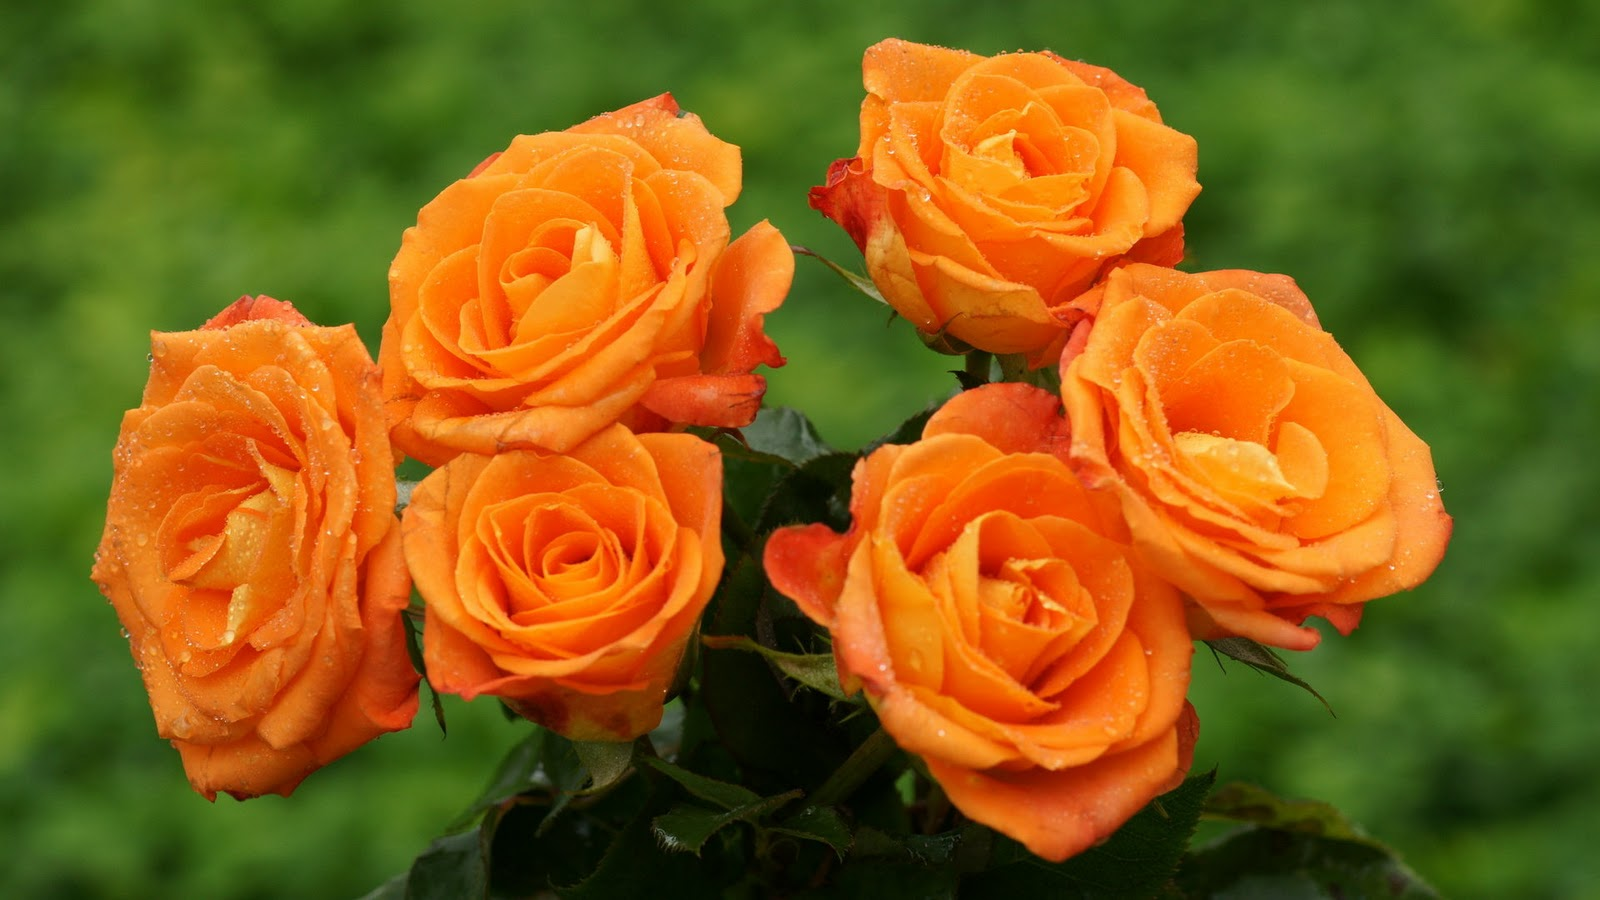 LAP TOP VALLEY: Orange Roses - Wallpaper